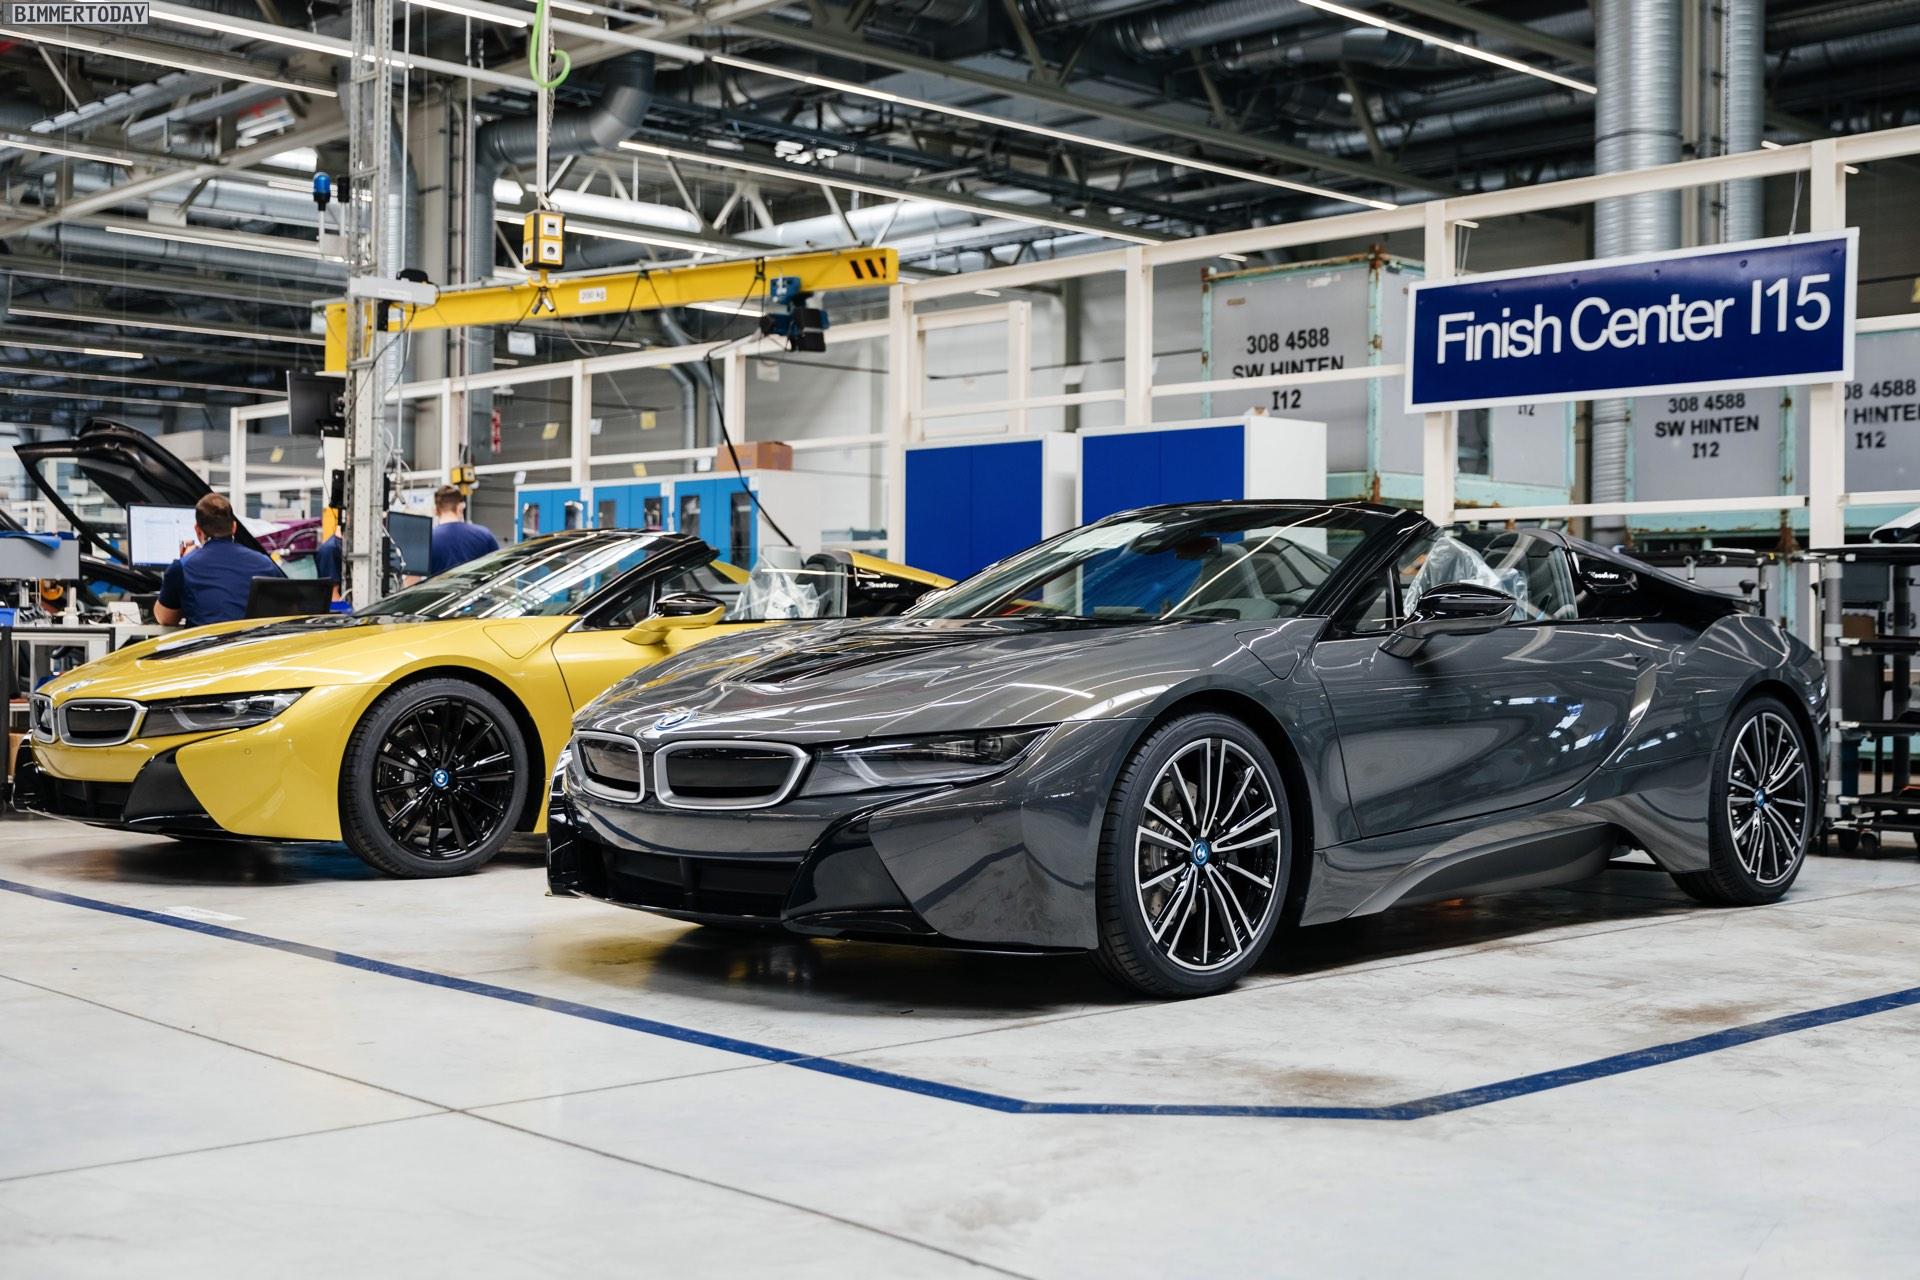 2013 - [BMW] i8 [i12] - Page 23 BMW-i8-Finale-Werk-Leipzig-Individual-Roadster-Produktion-13